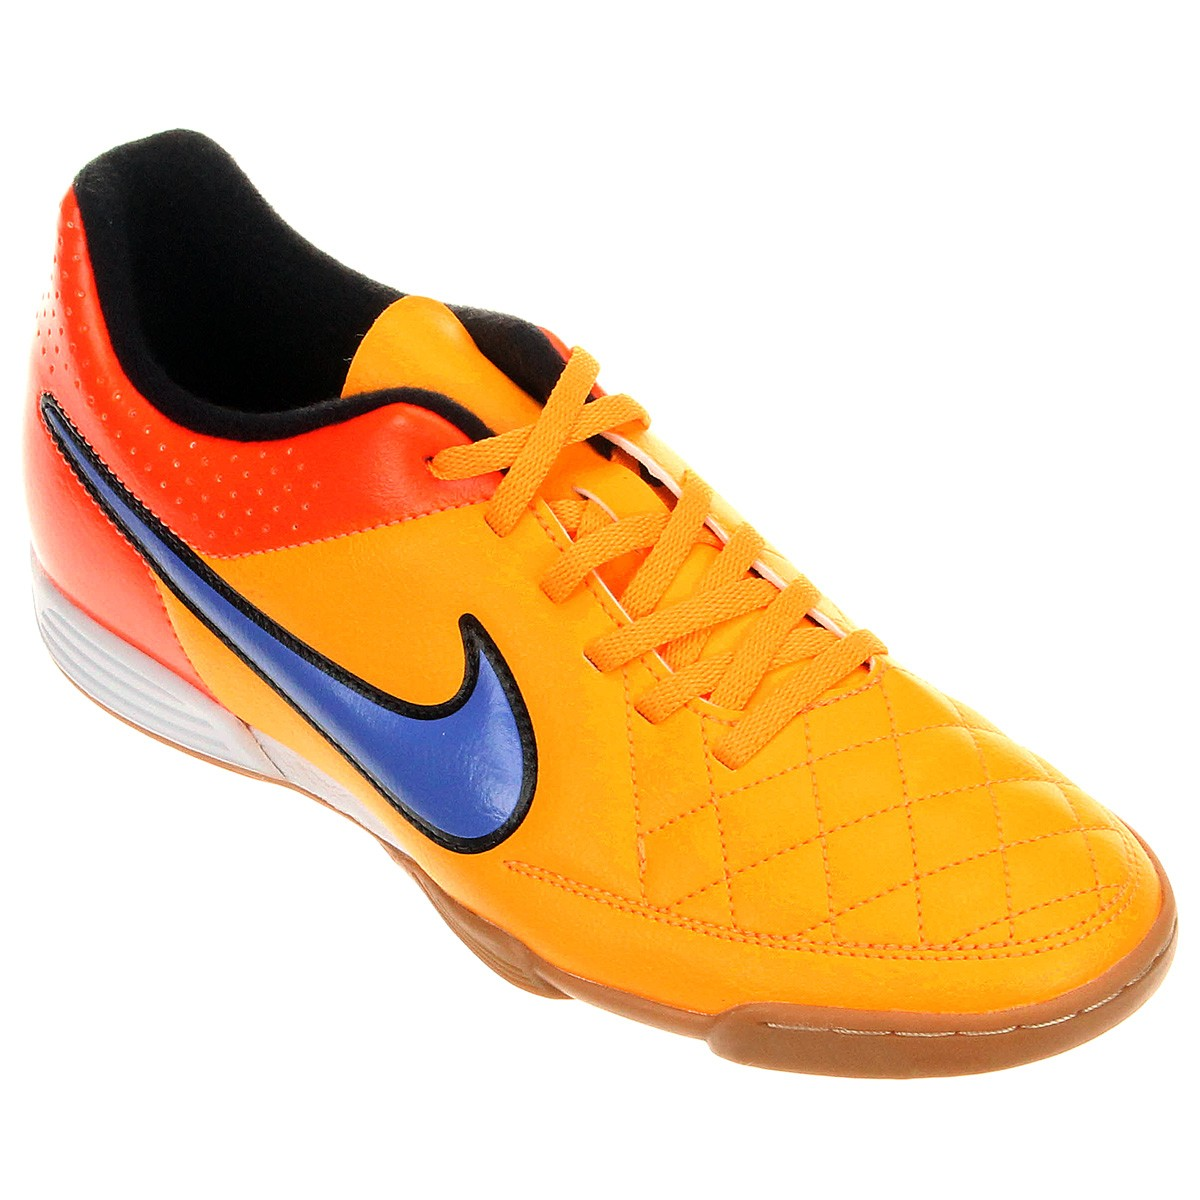 86e2d407d Bizz Store - Chuteira Futsal Nike Tiempo Rio II IC Masculina